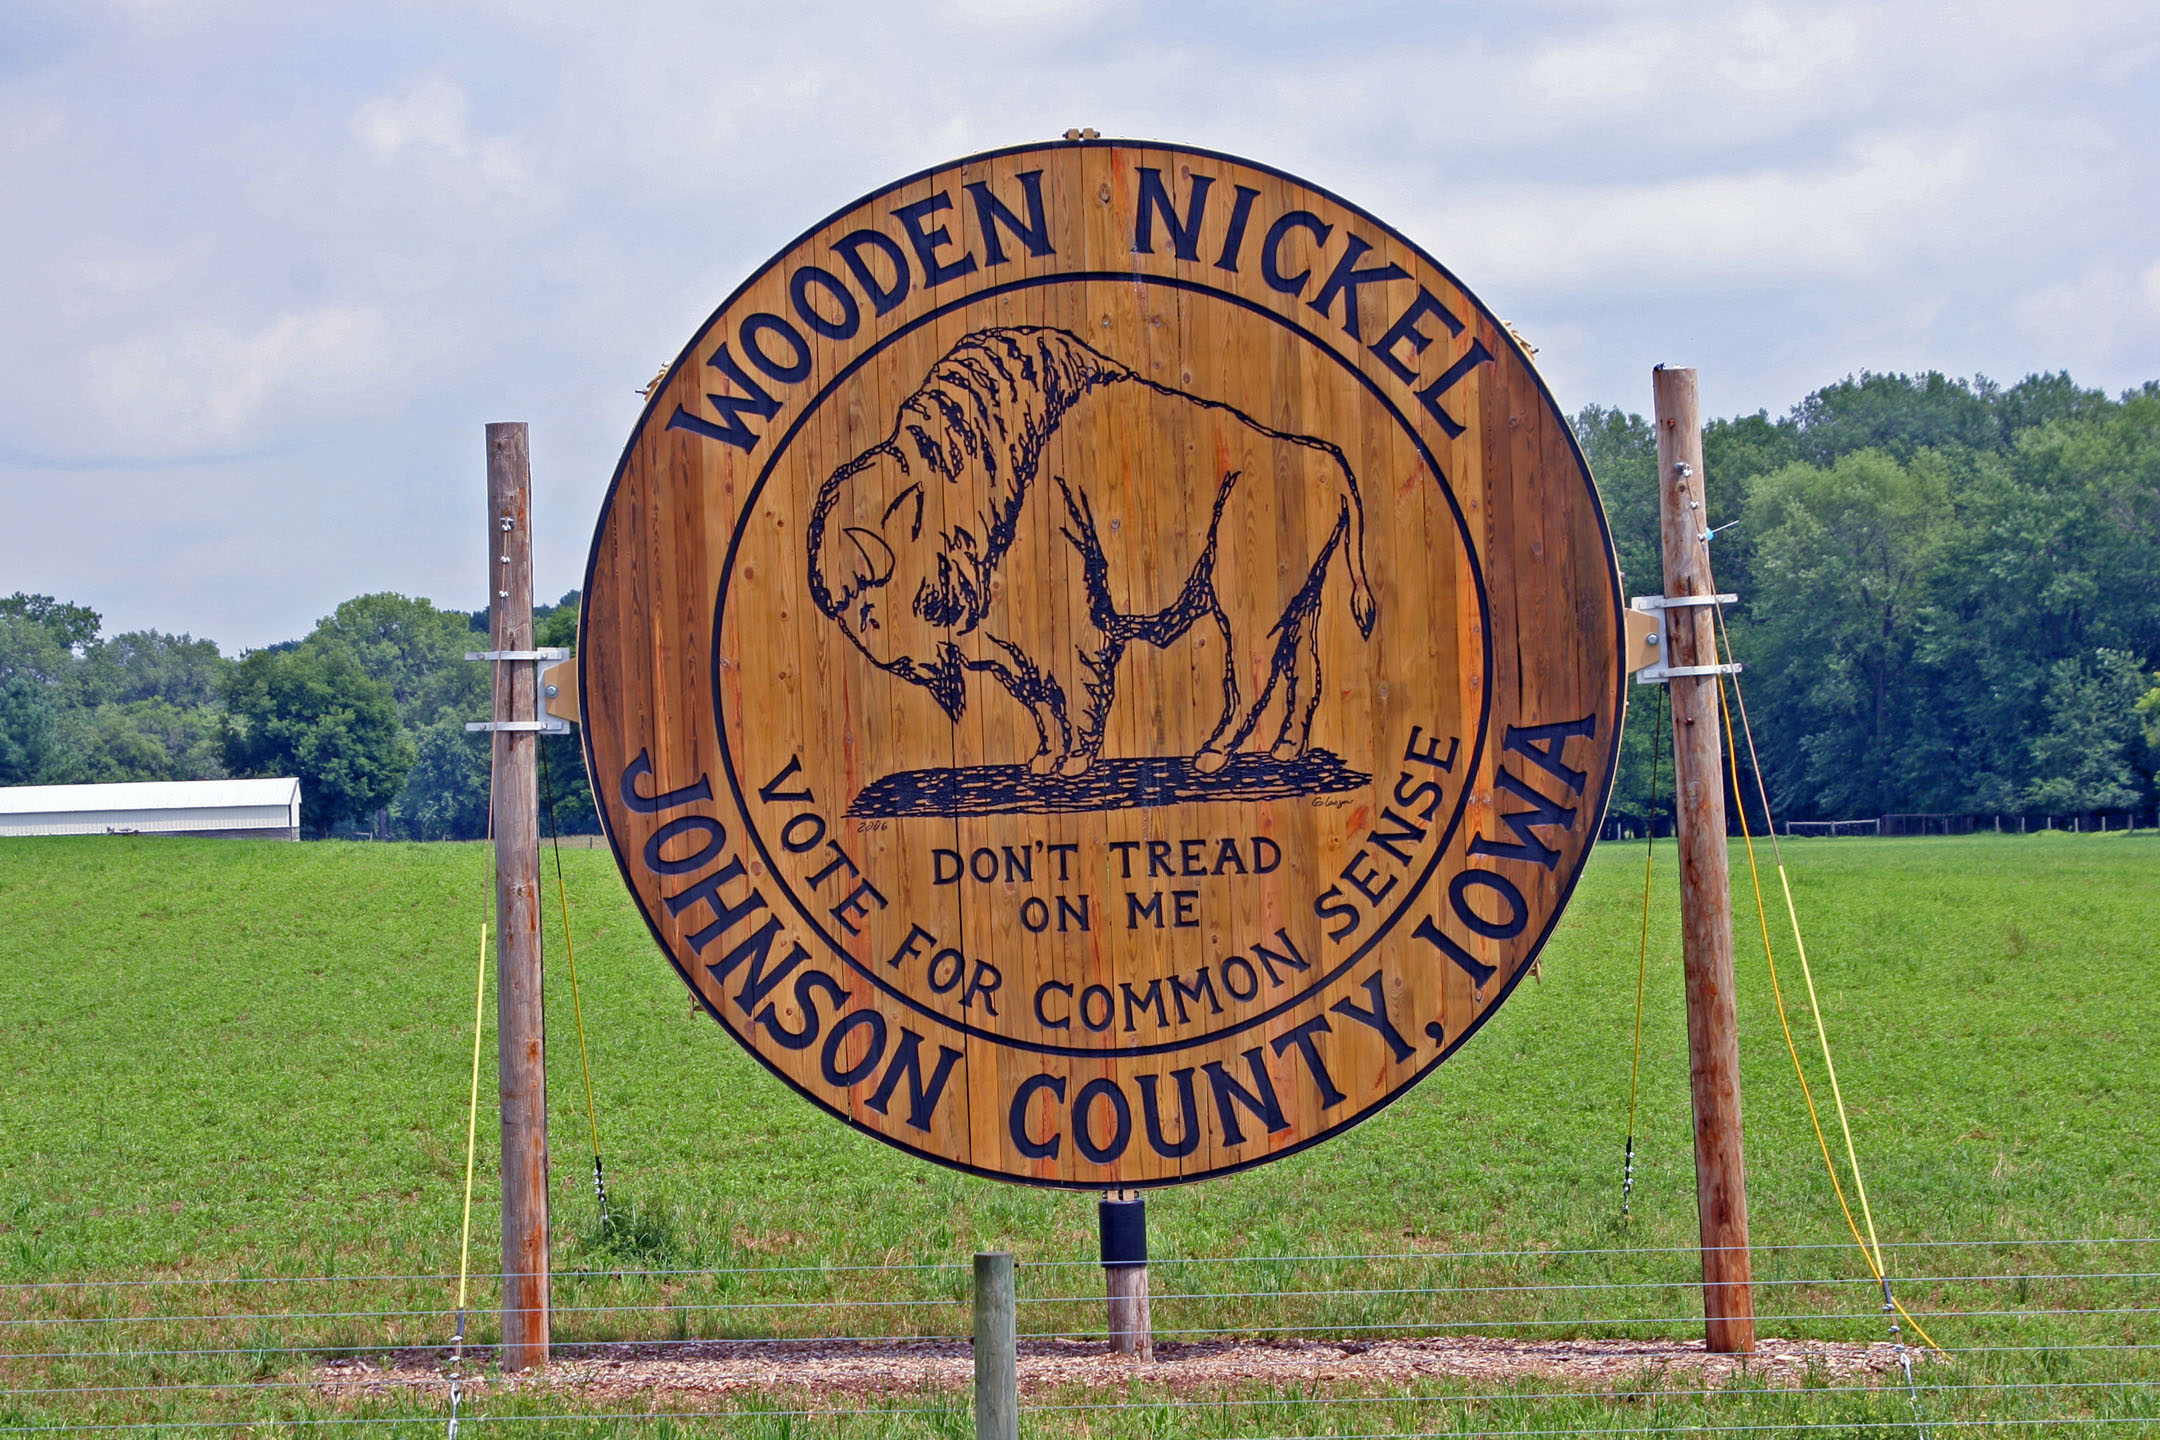 world's largest wooden nickel